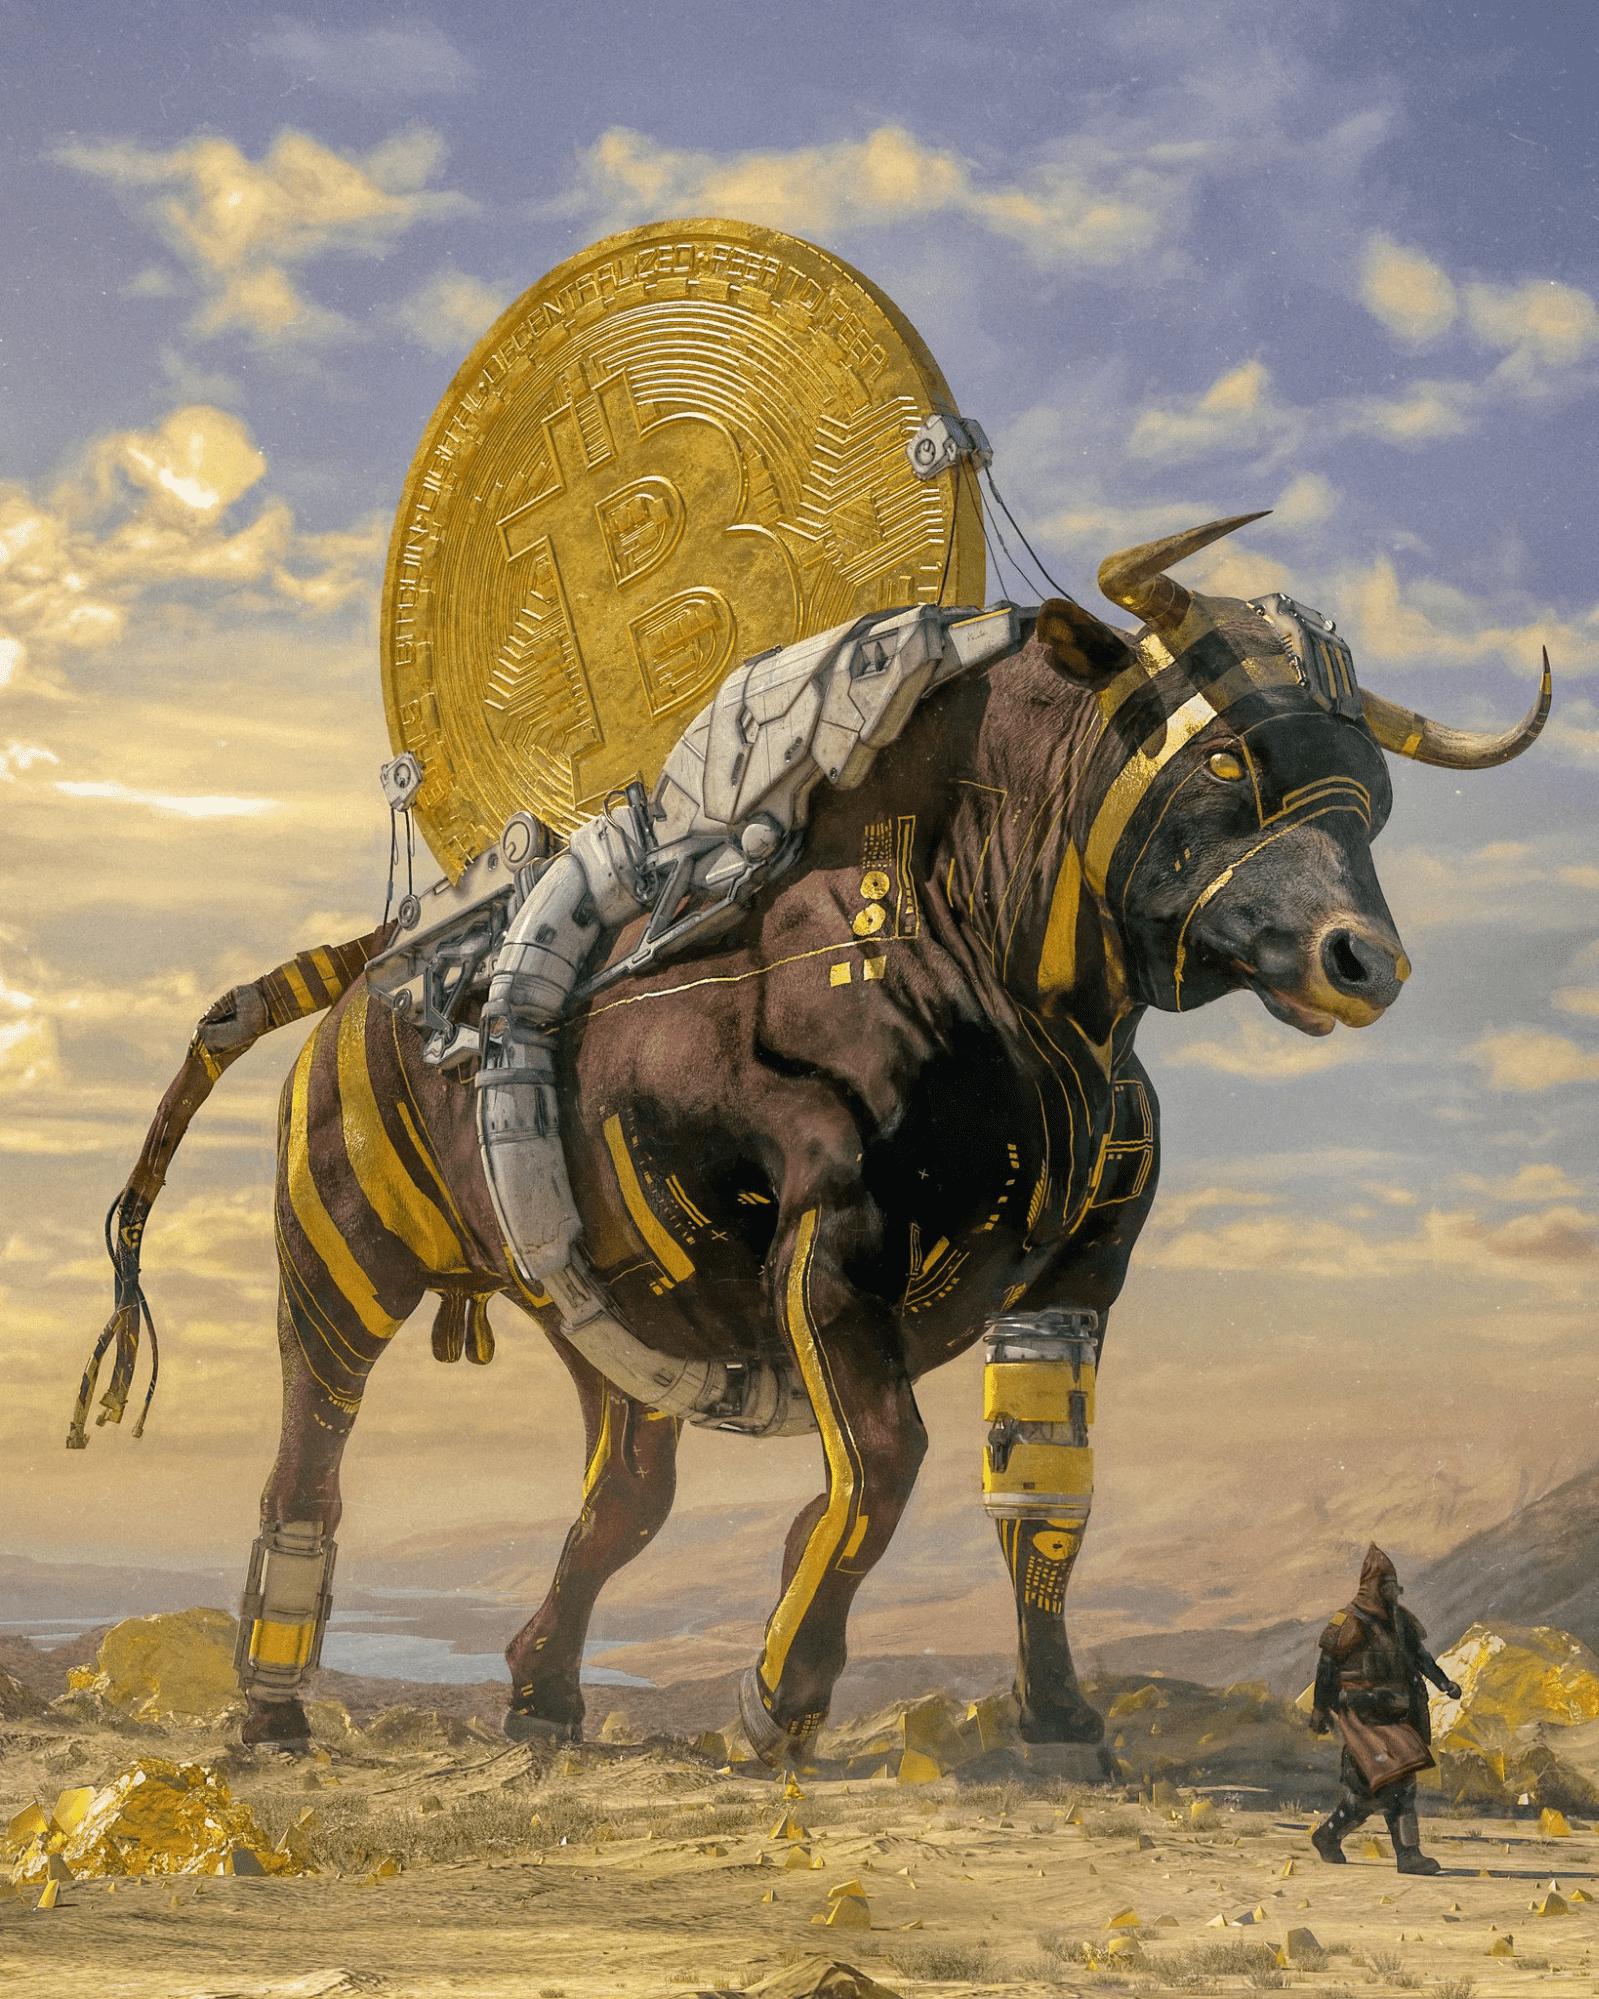 Bull Run #6/271 by Beeple